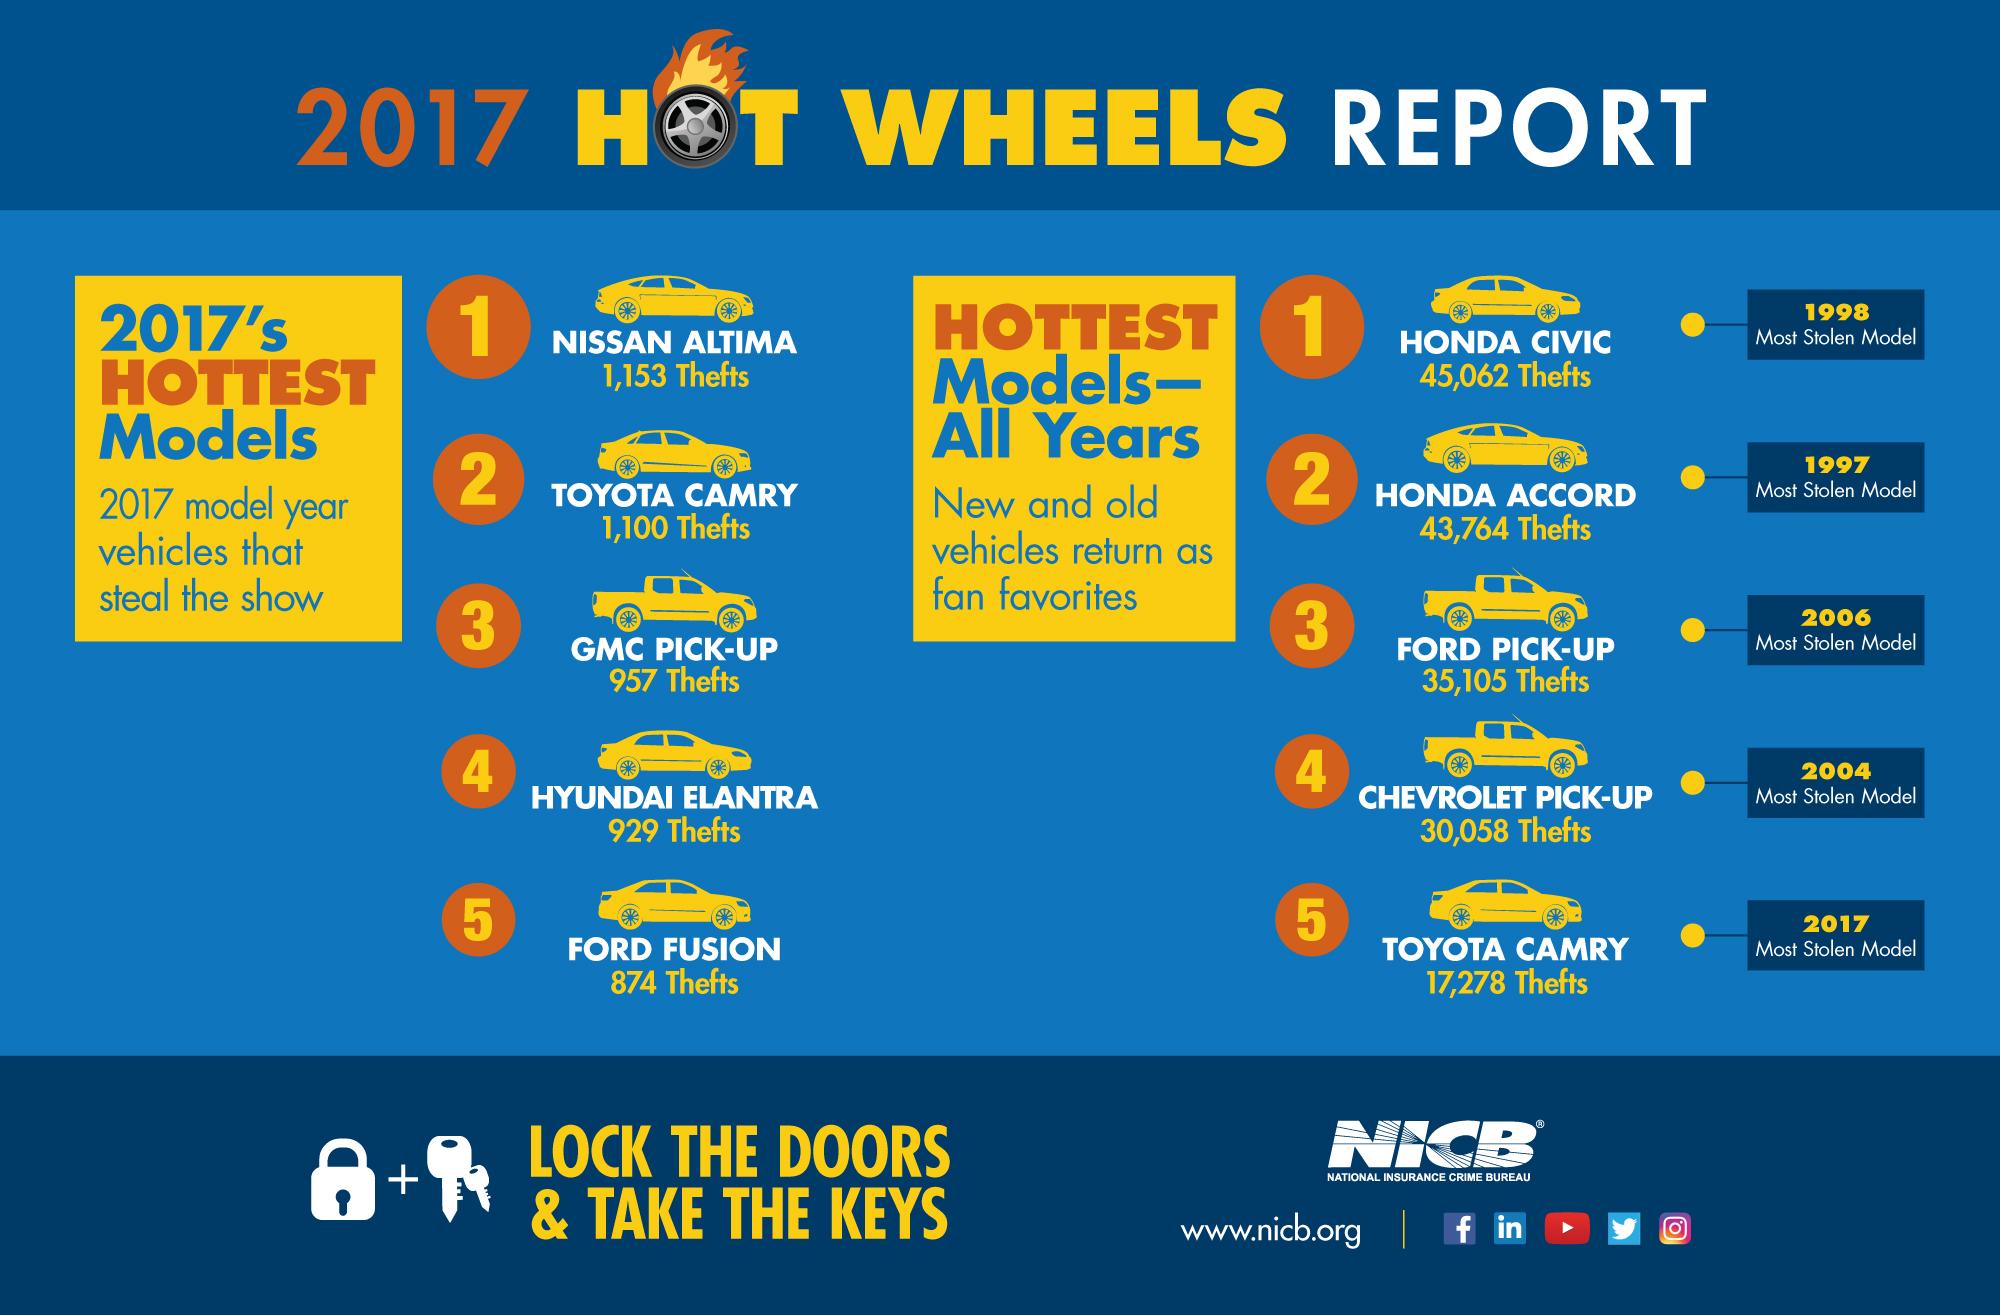 NICB 2017 HotWheels